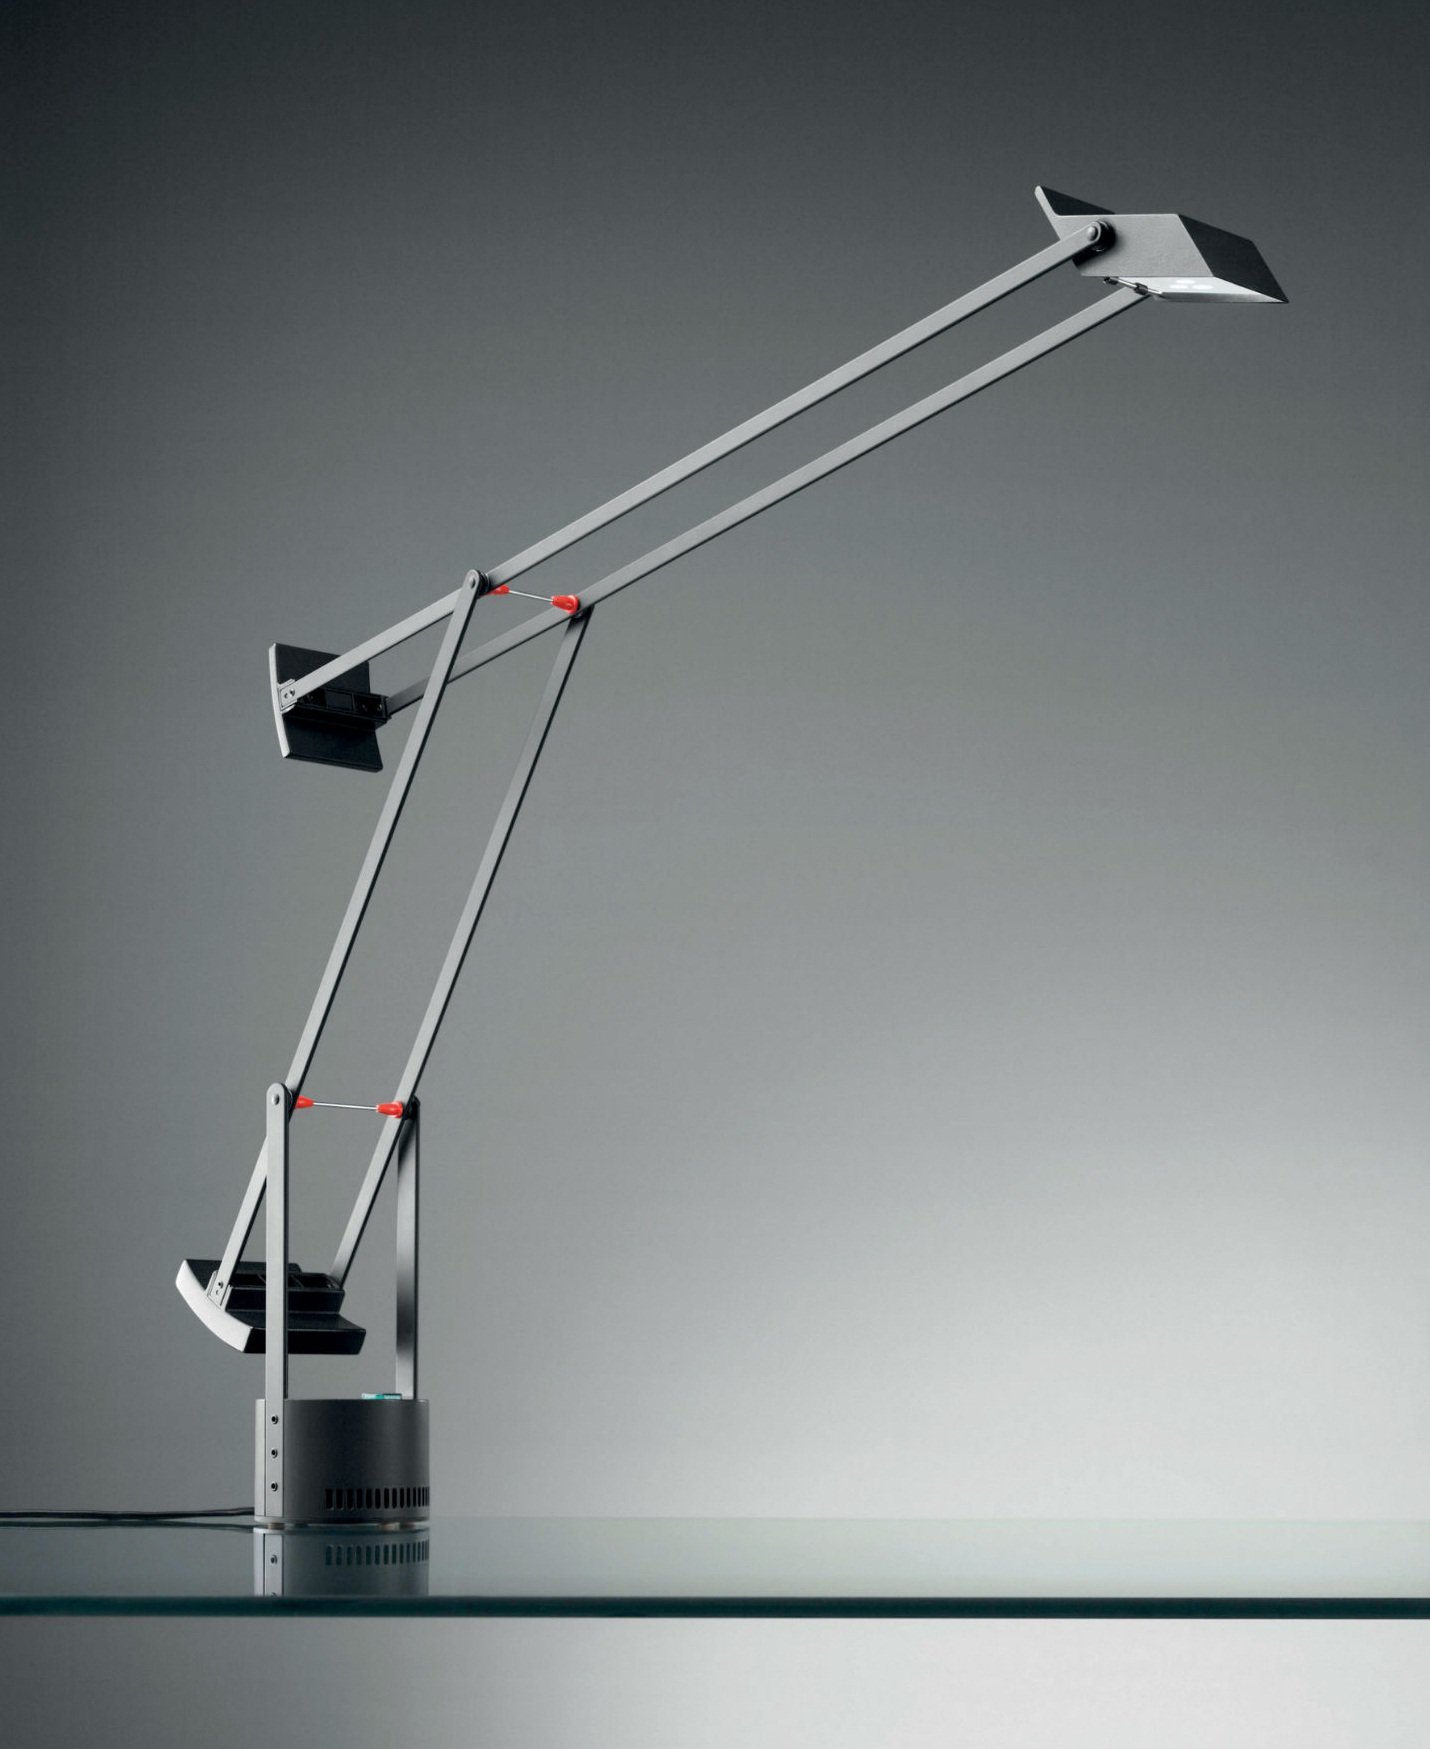 Artemide tizio led lampade di lampada da tavolo a009210 for Led lampade